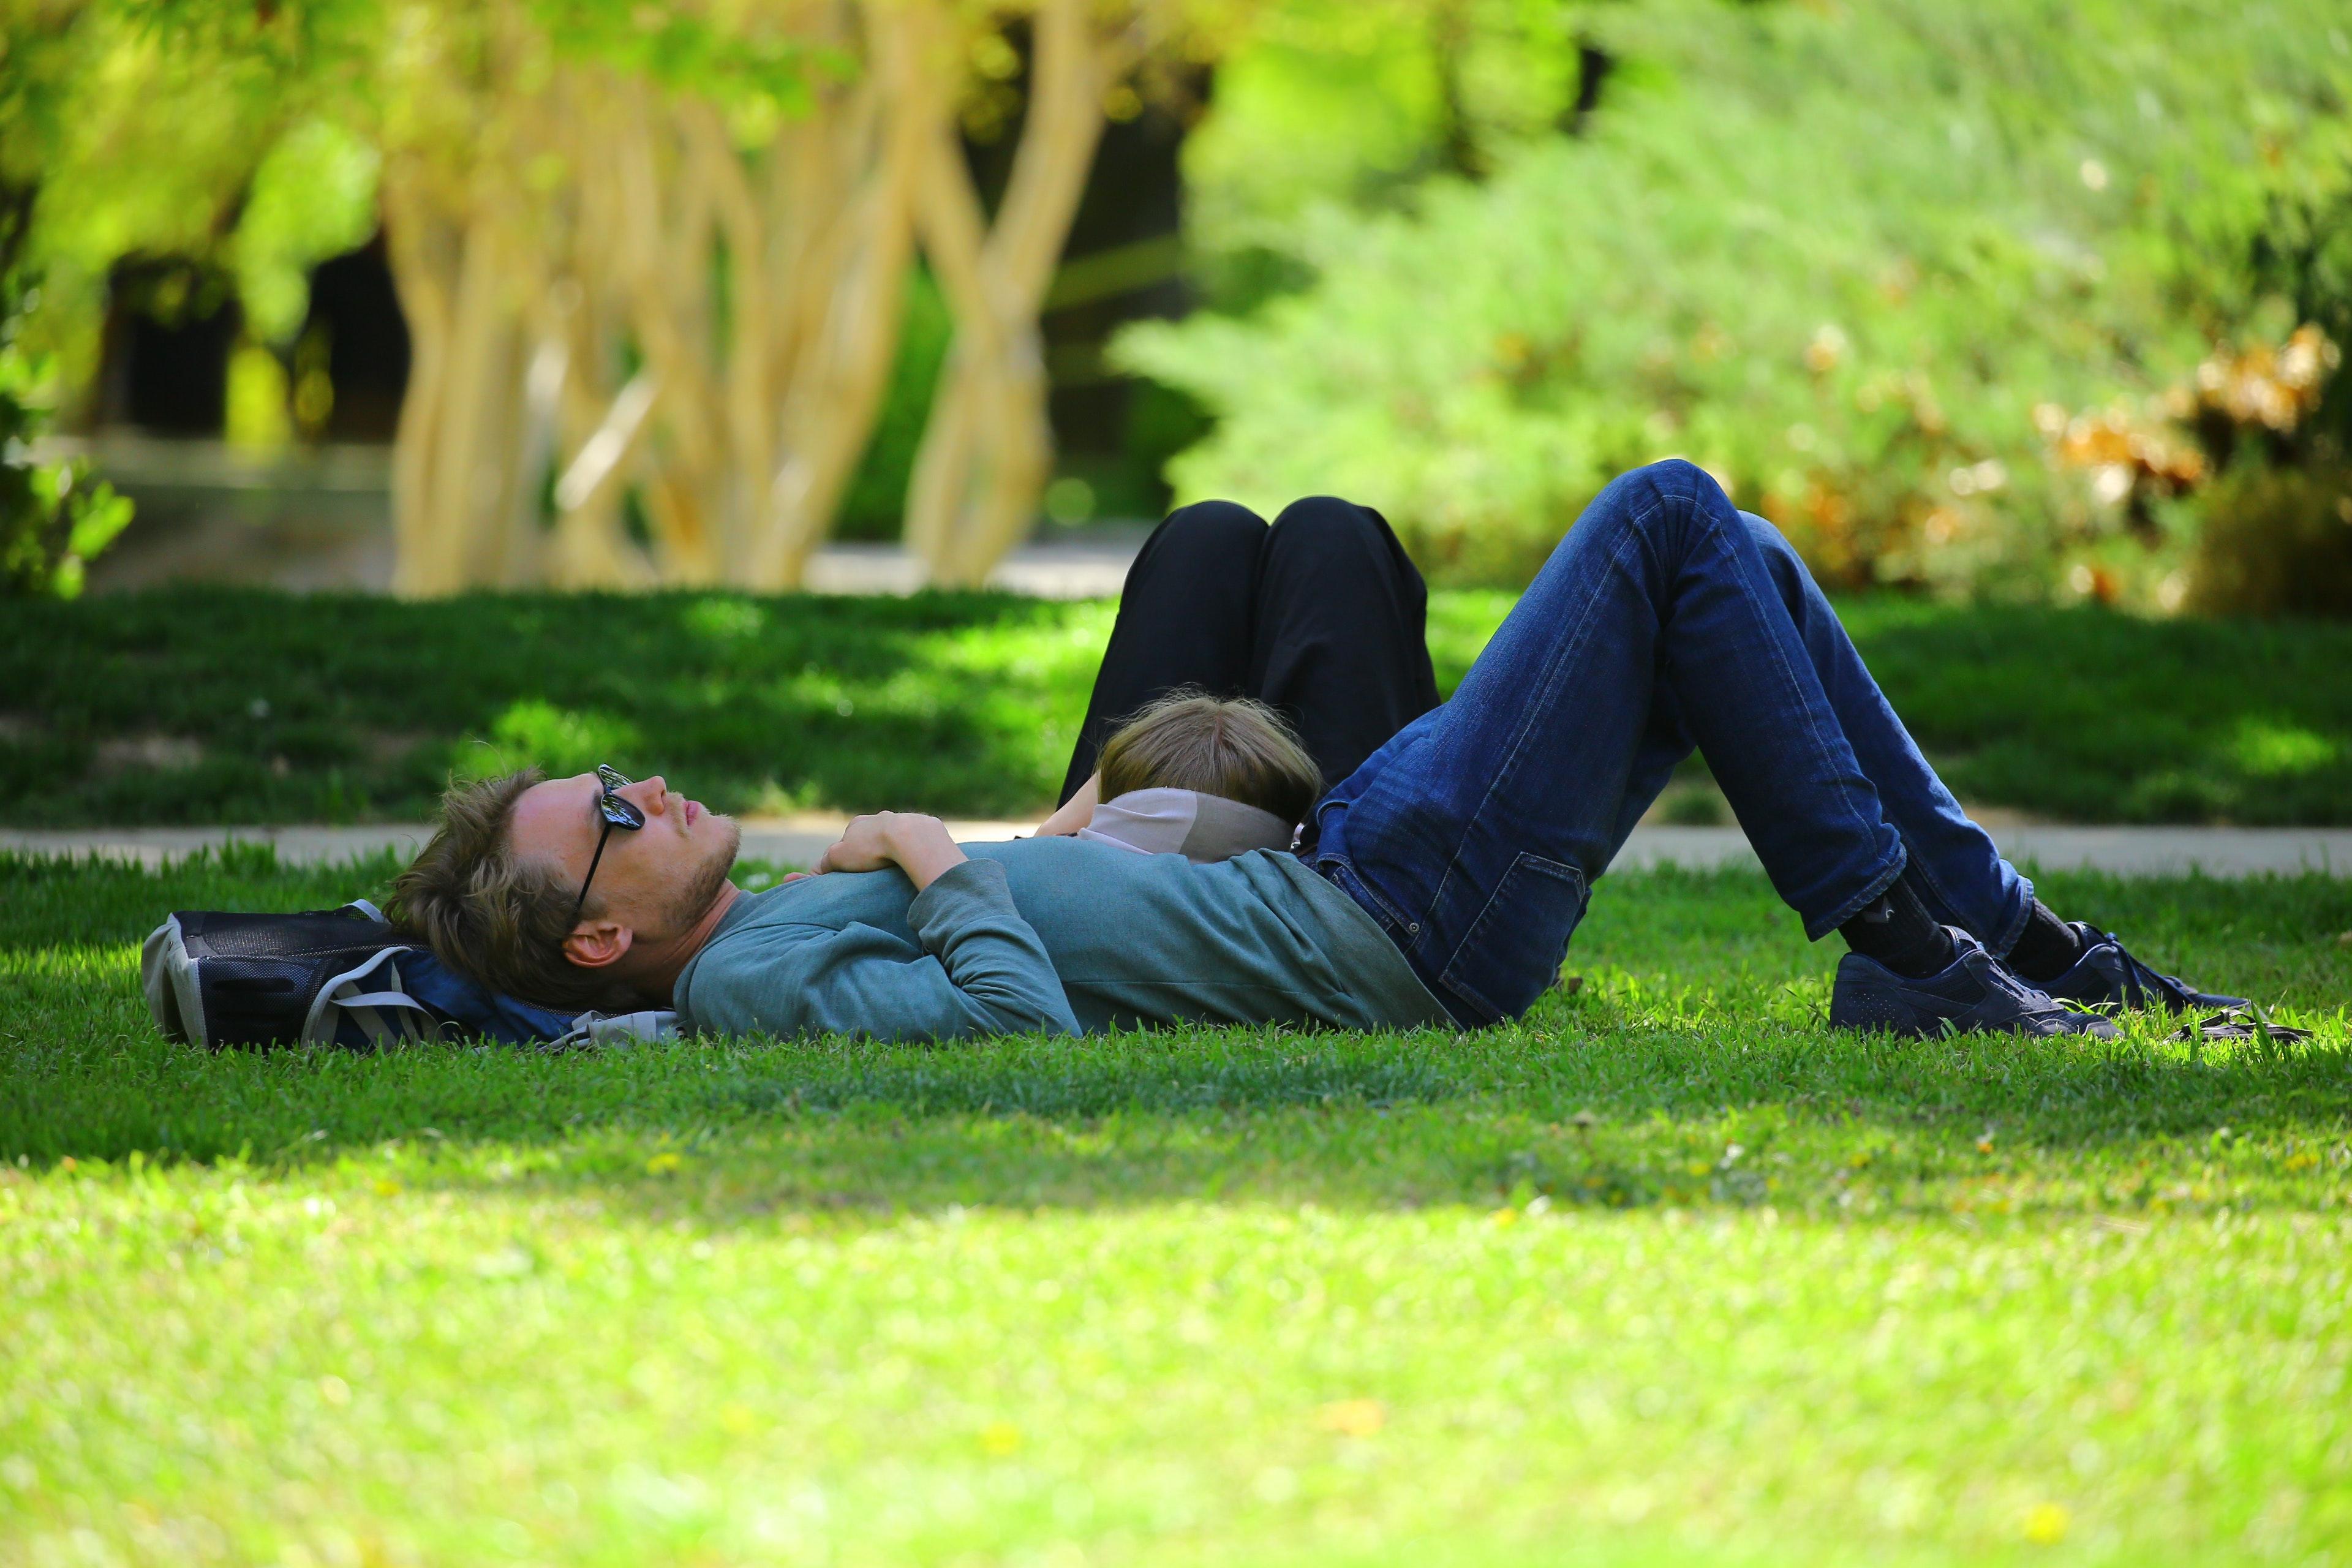 Man Wearing Blue Long Sleeve Shirt Lying on Ground during Daytime, Adult, Park, Summer, Sleep, HQ Photo